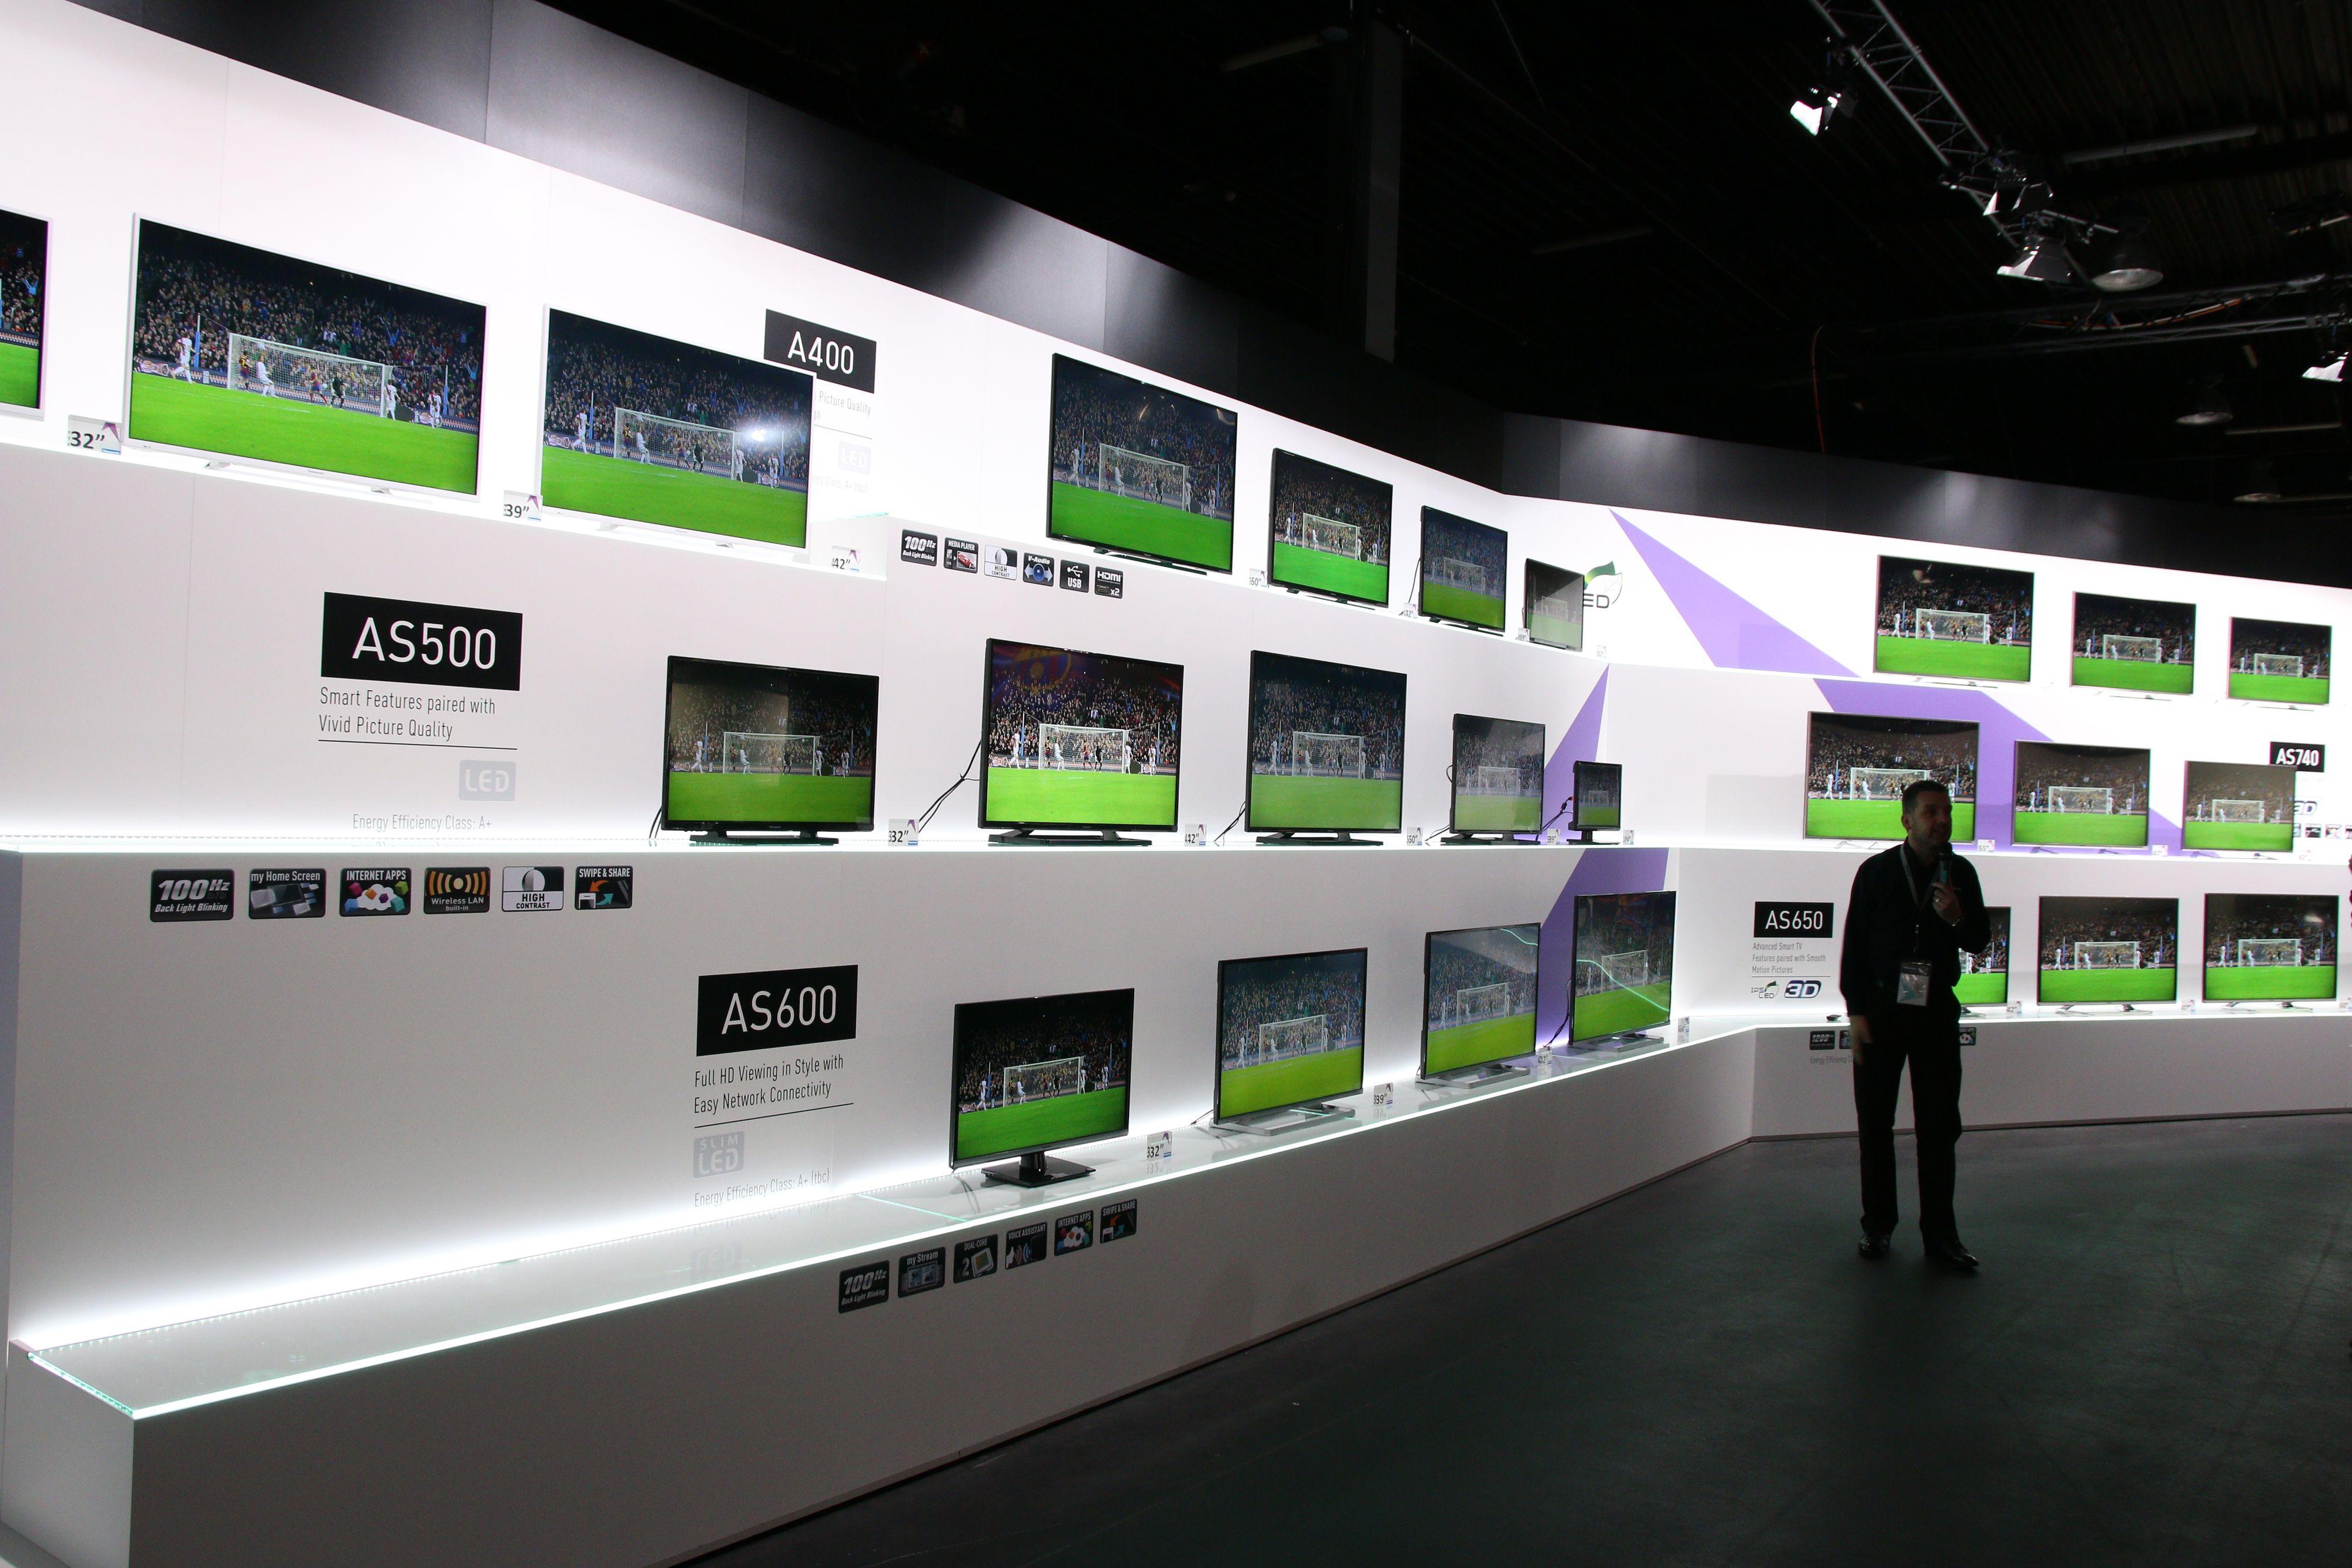 Panasonic slipper mange nye serier i 2014.